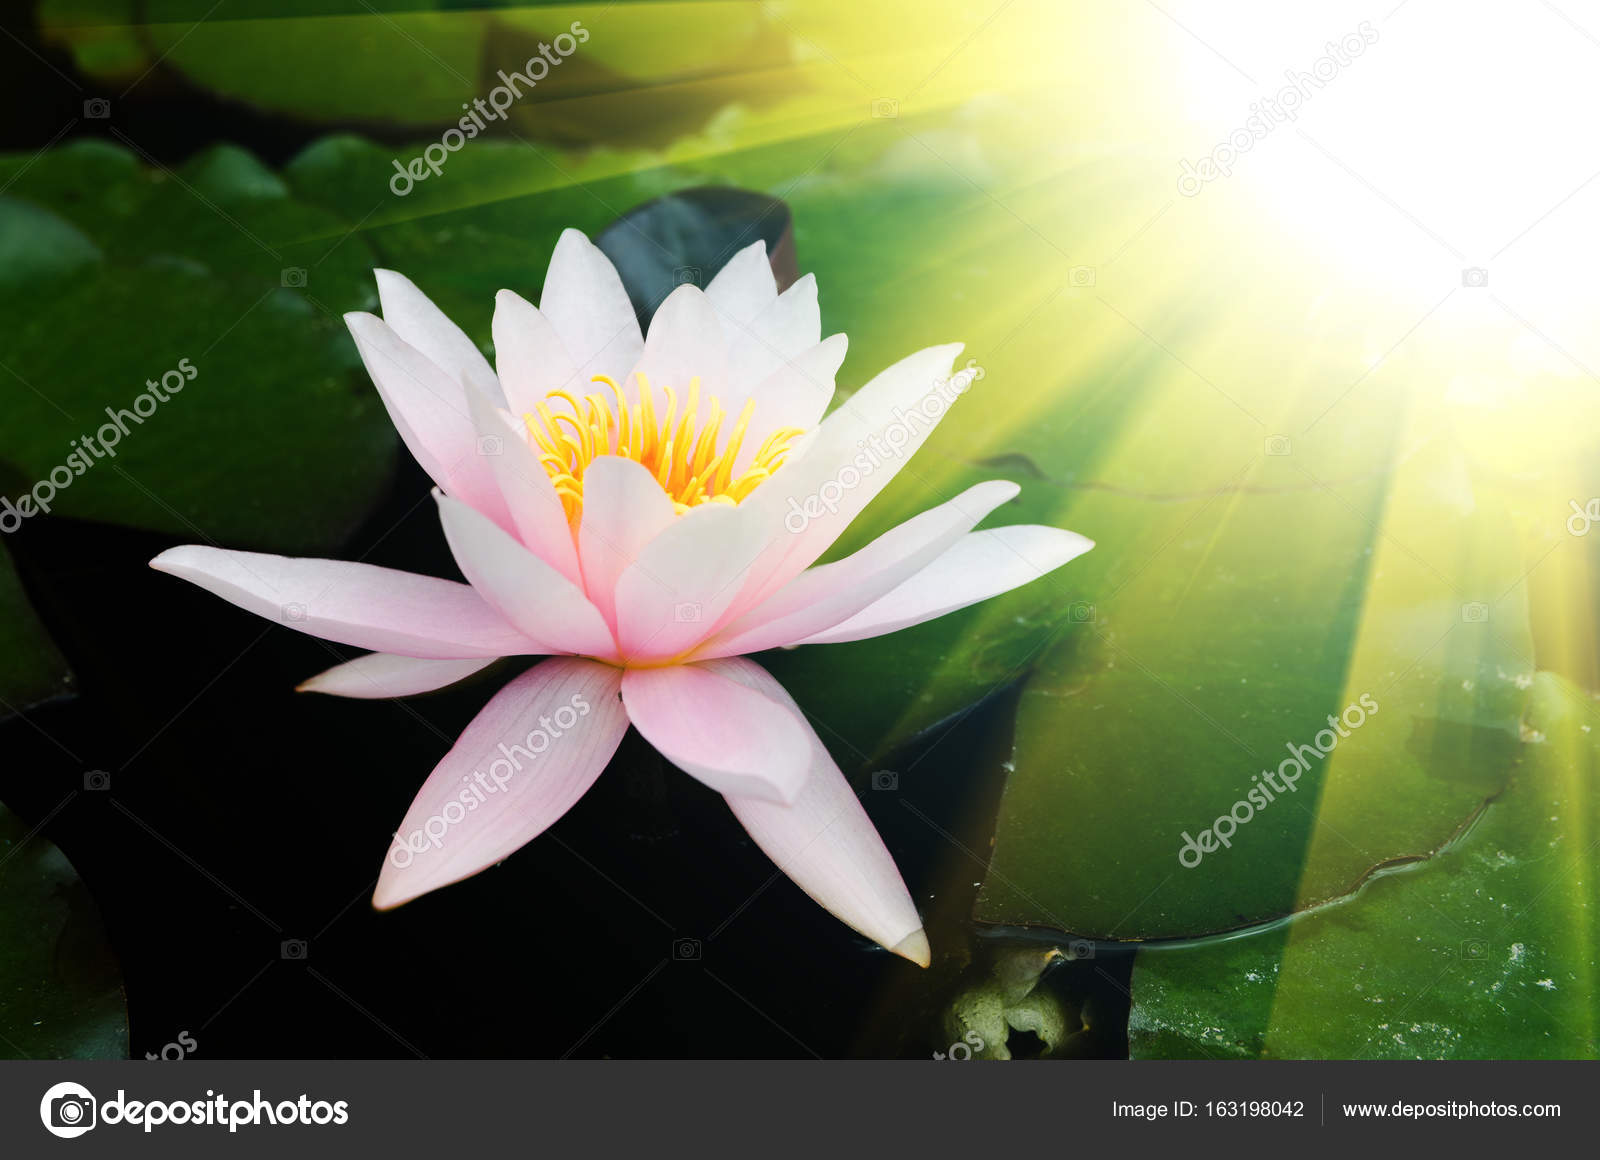 Beautiful lotus flower stock photo klagyivik 163198042 beautiful lotus flower on pond photo by klagyivik izmirmasajfo Images